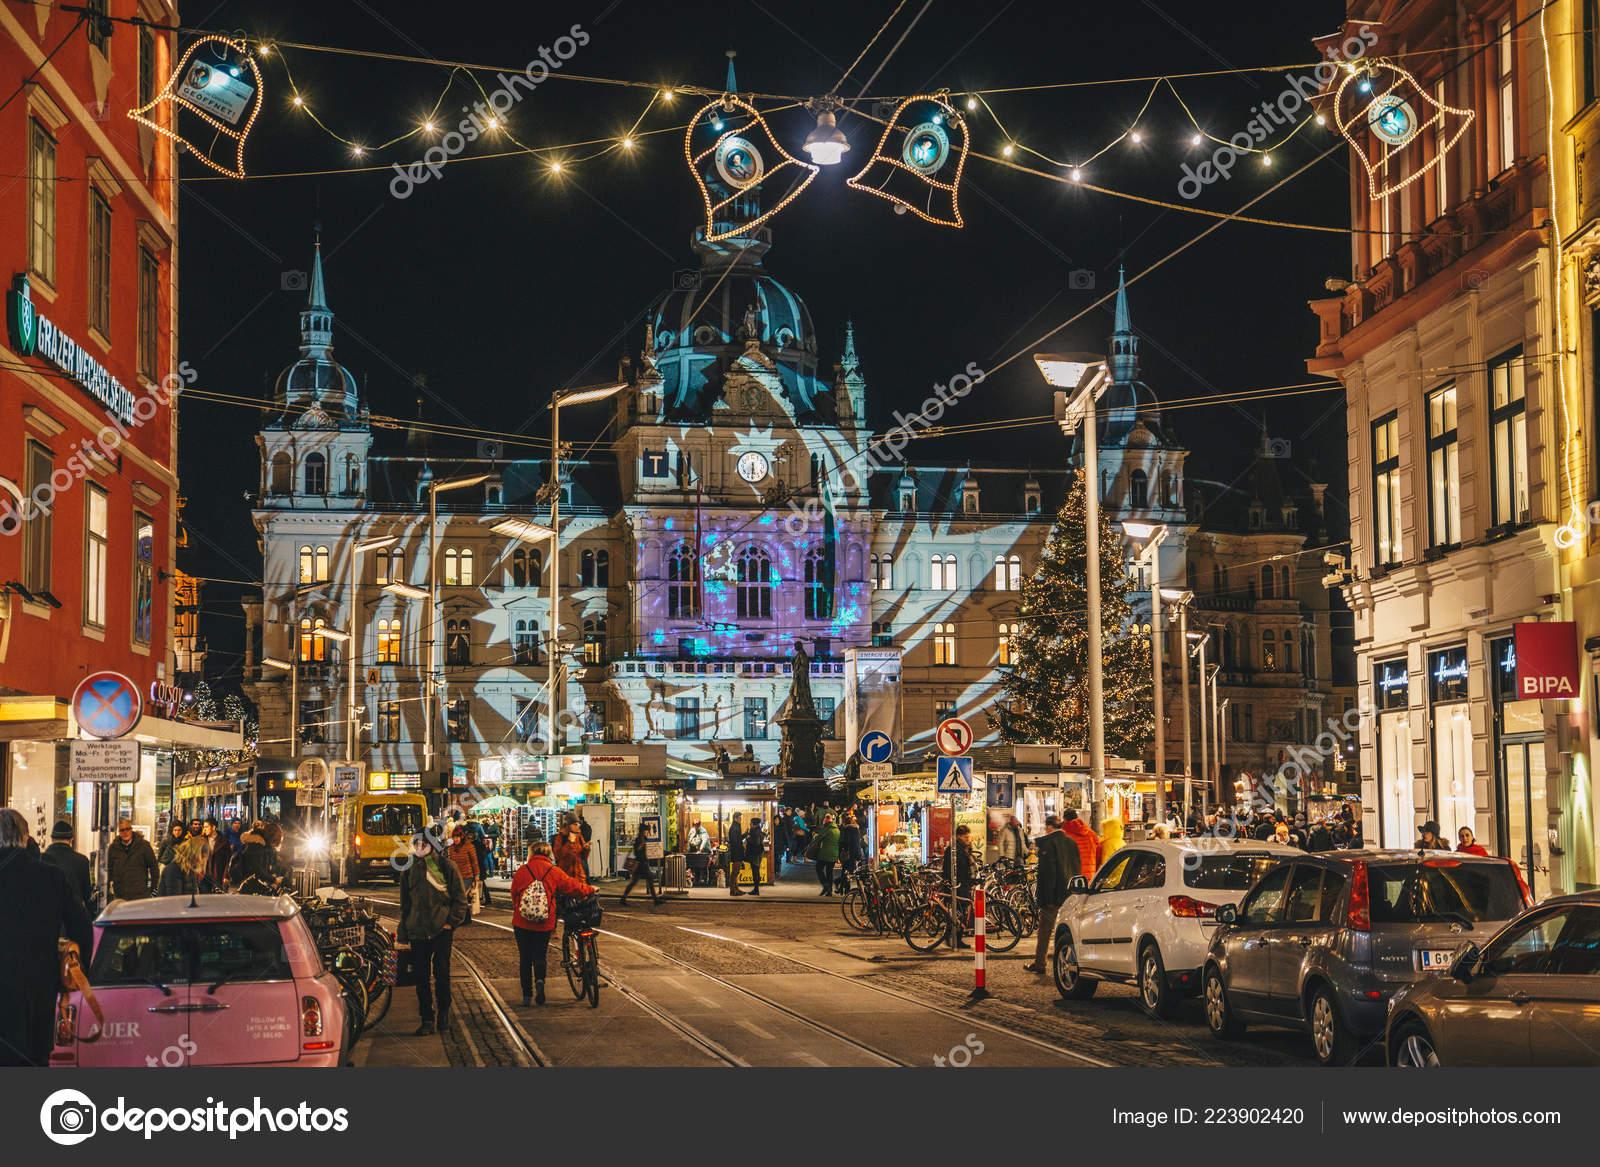 Christmas In Austria Holidays.Graz Austria December 2017 Christmas Decorated Town Graz